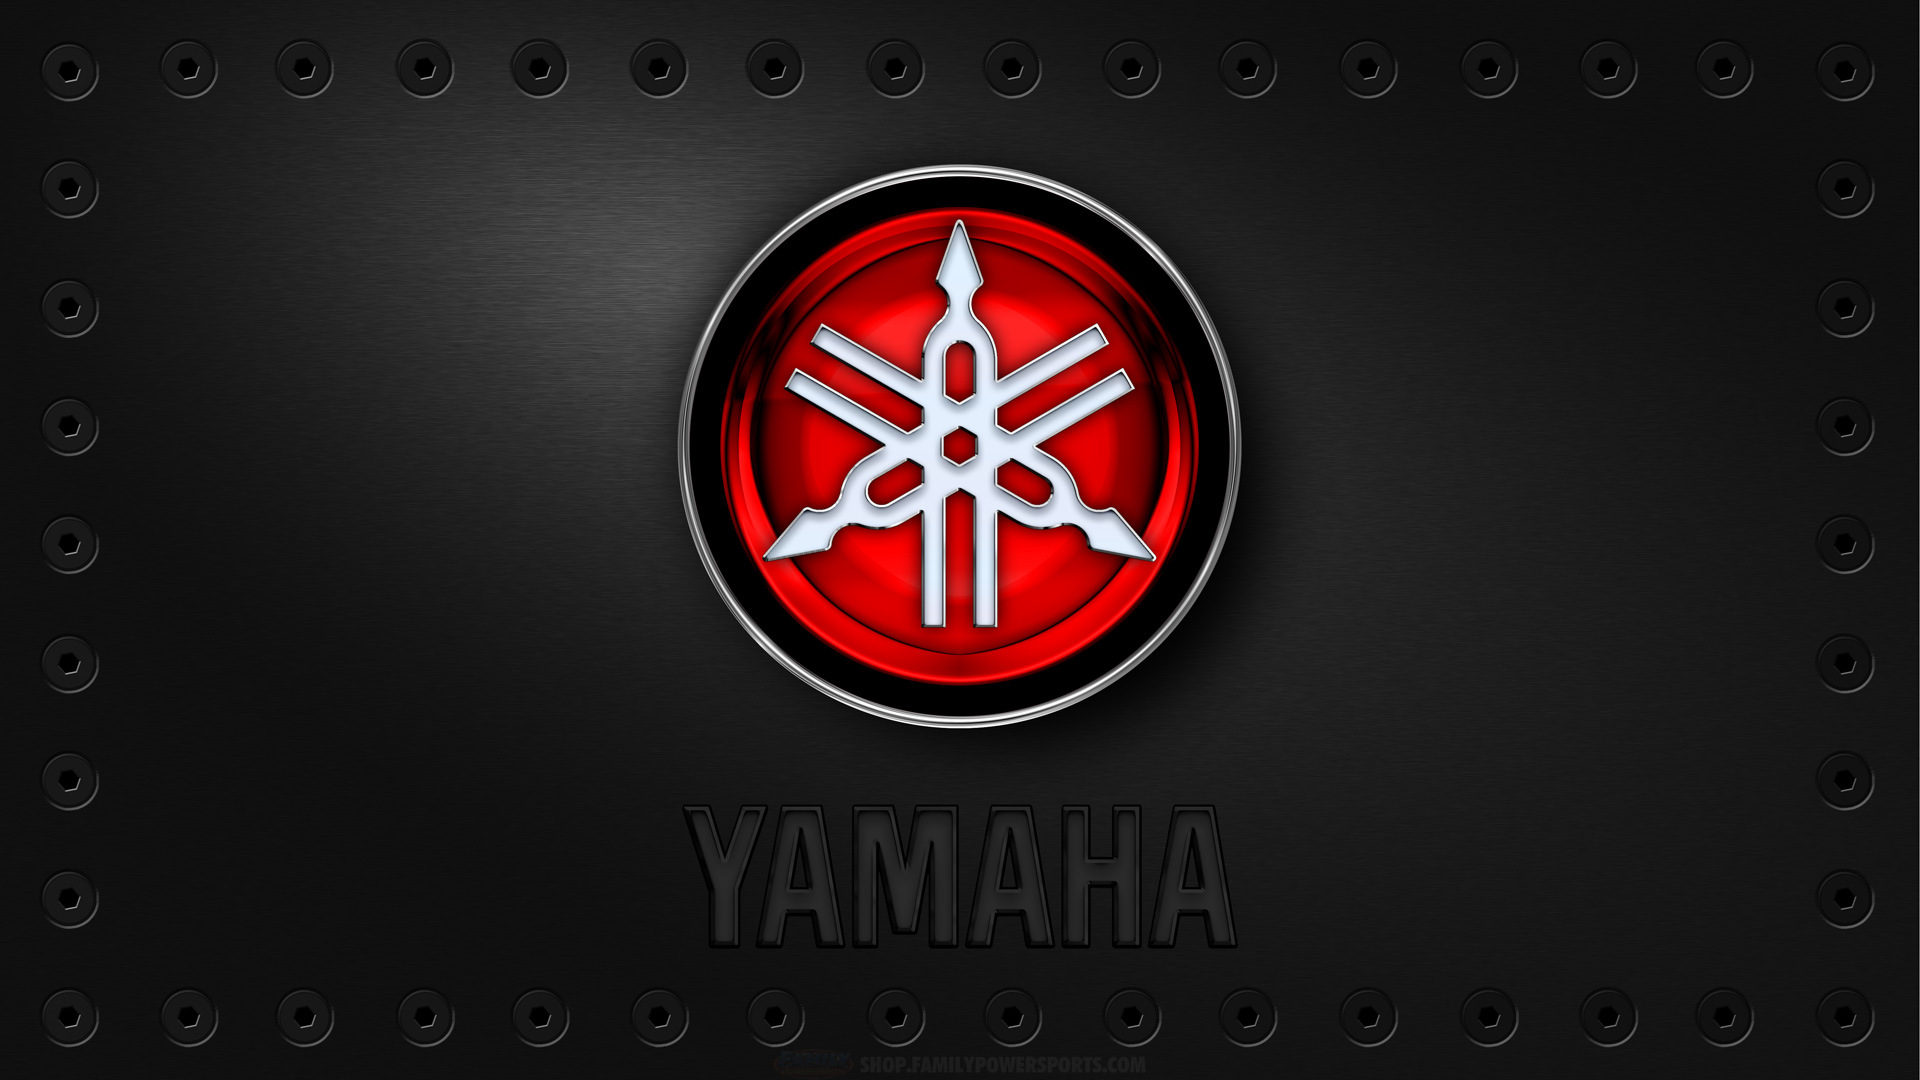 8589130512261 yamaha logo wallpaper hdjpg 1920x1080